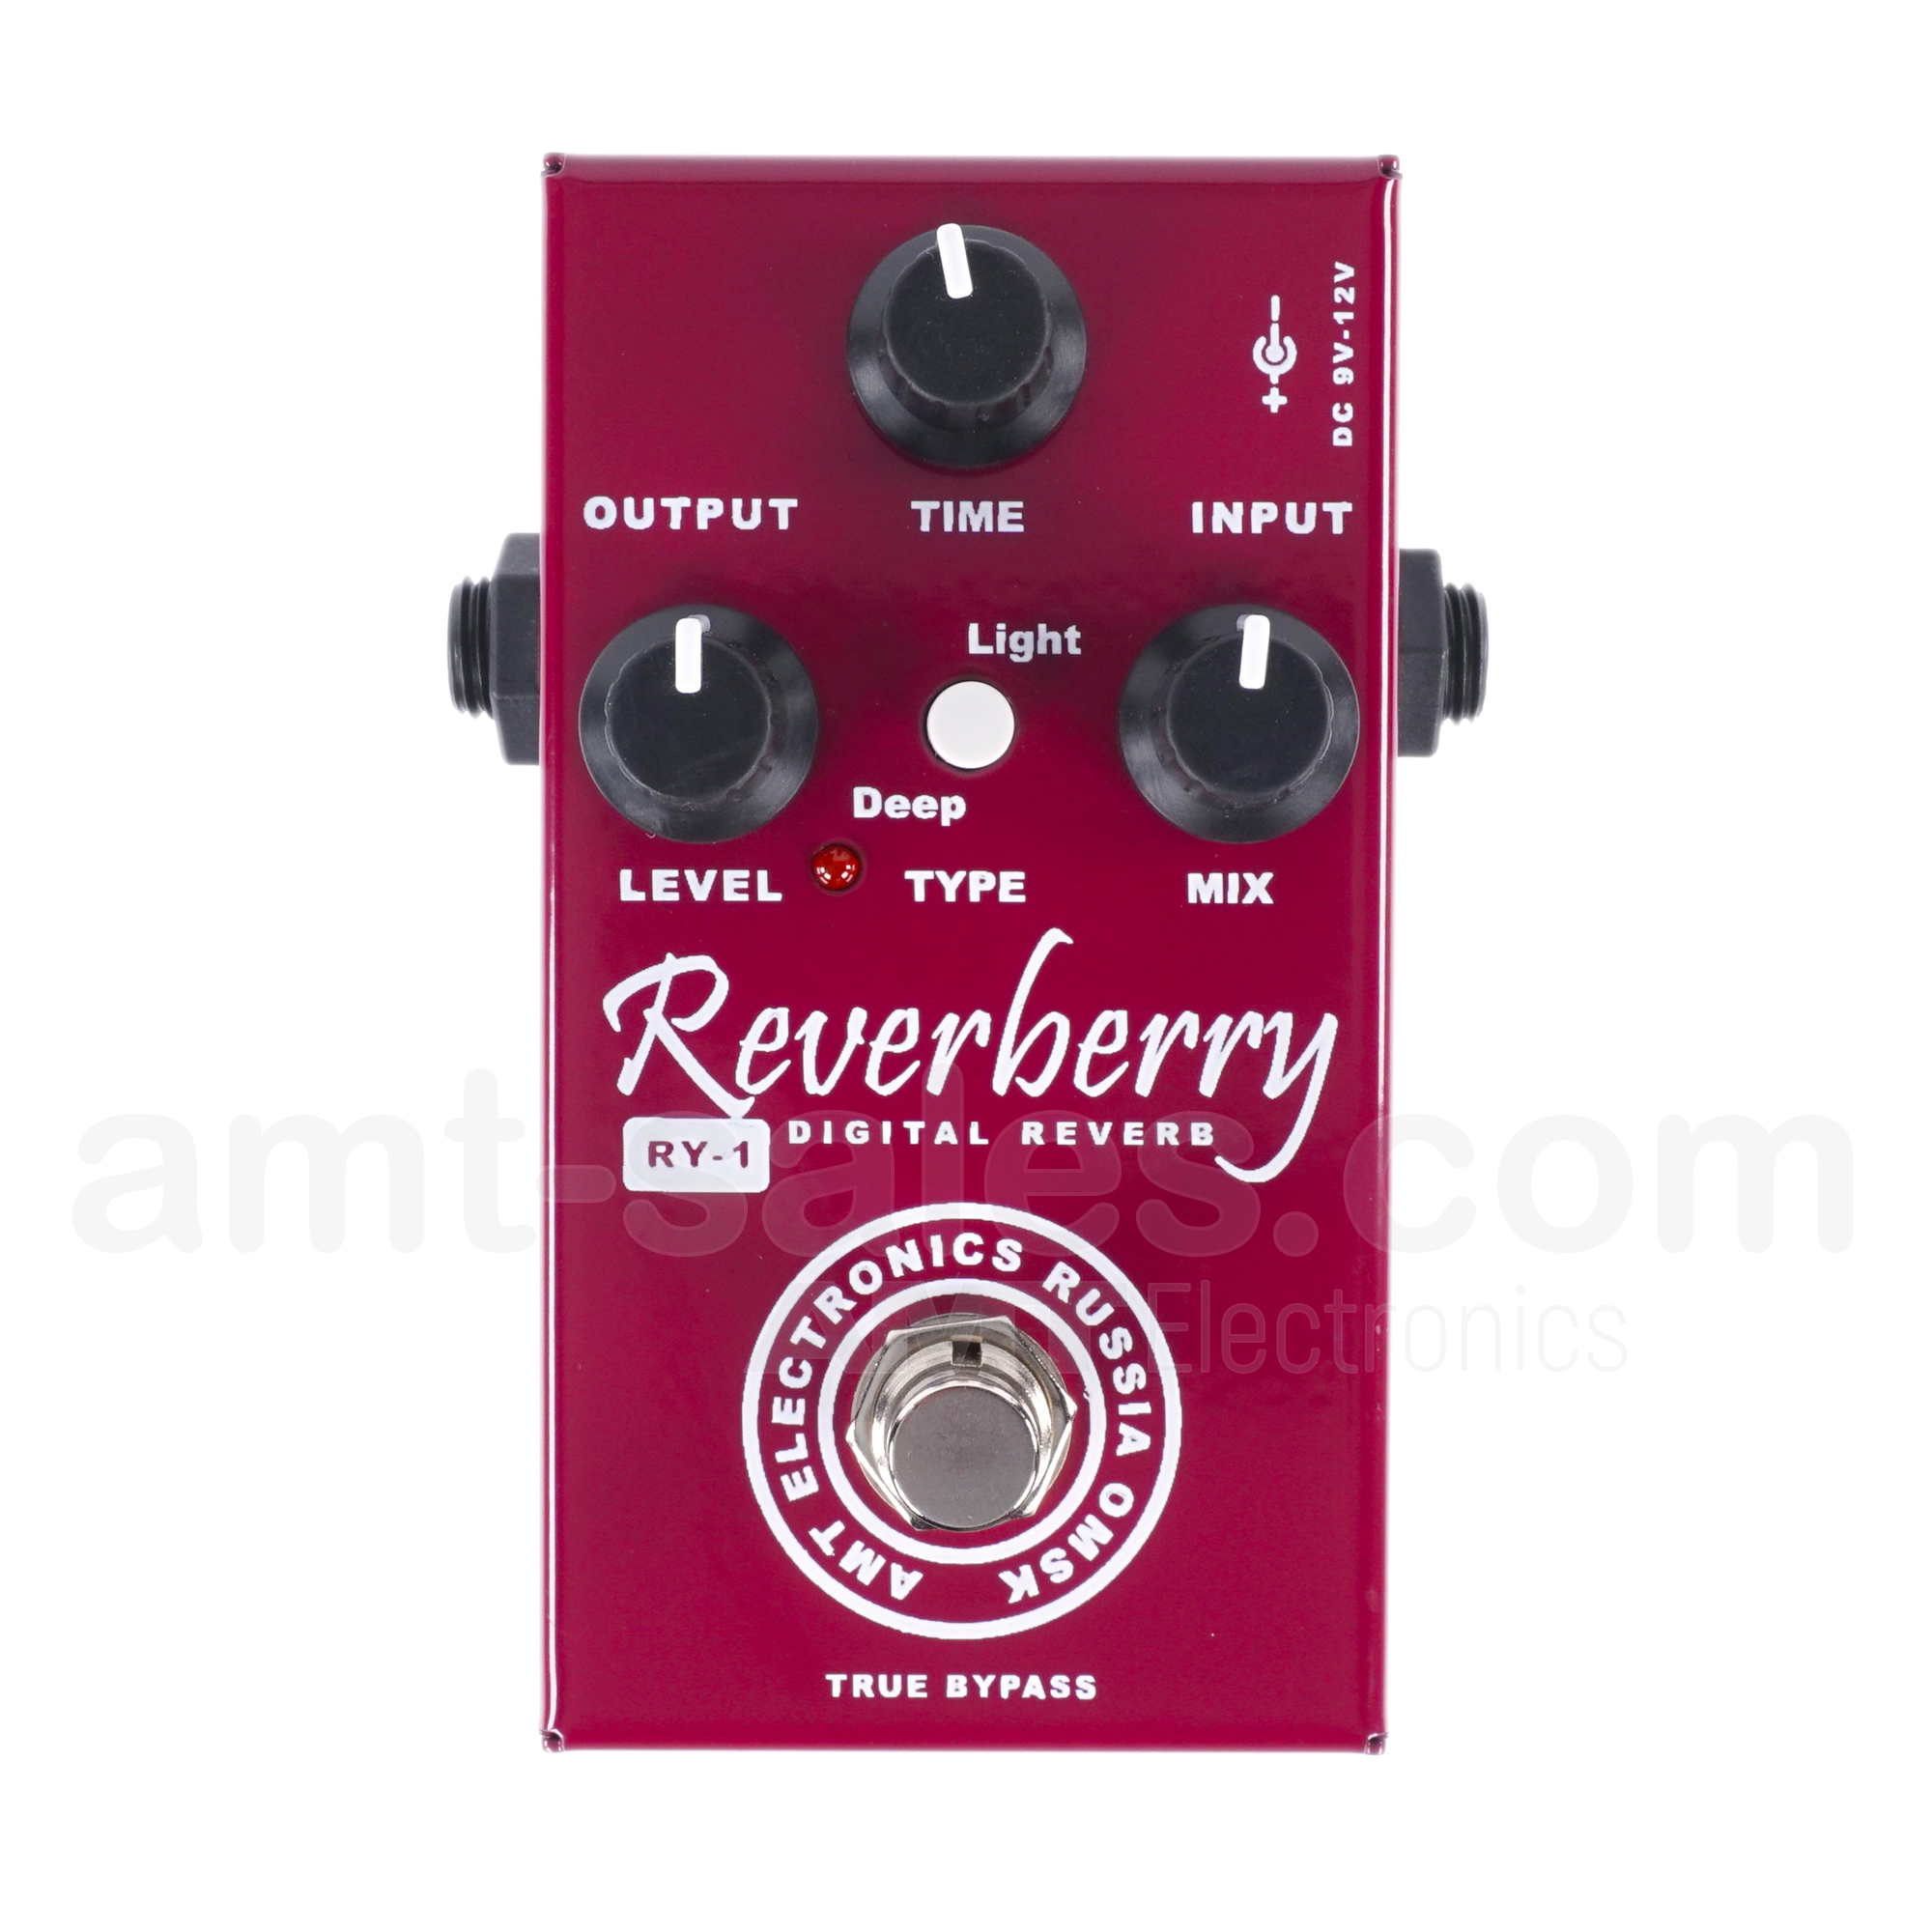 AMT RY-1 Reverberry - HQ Digital Reverb